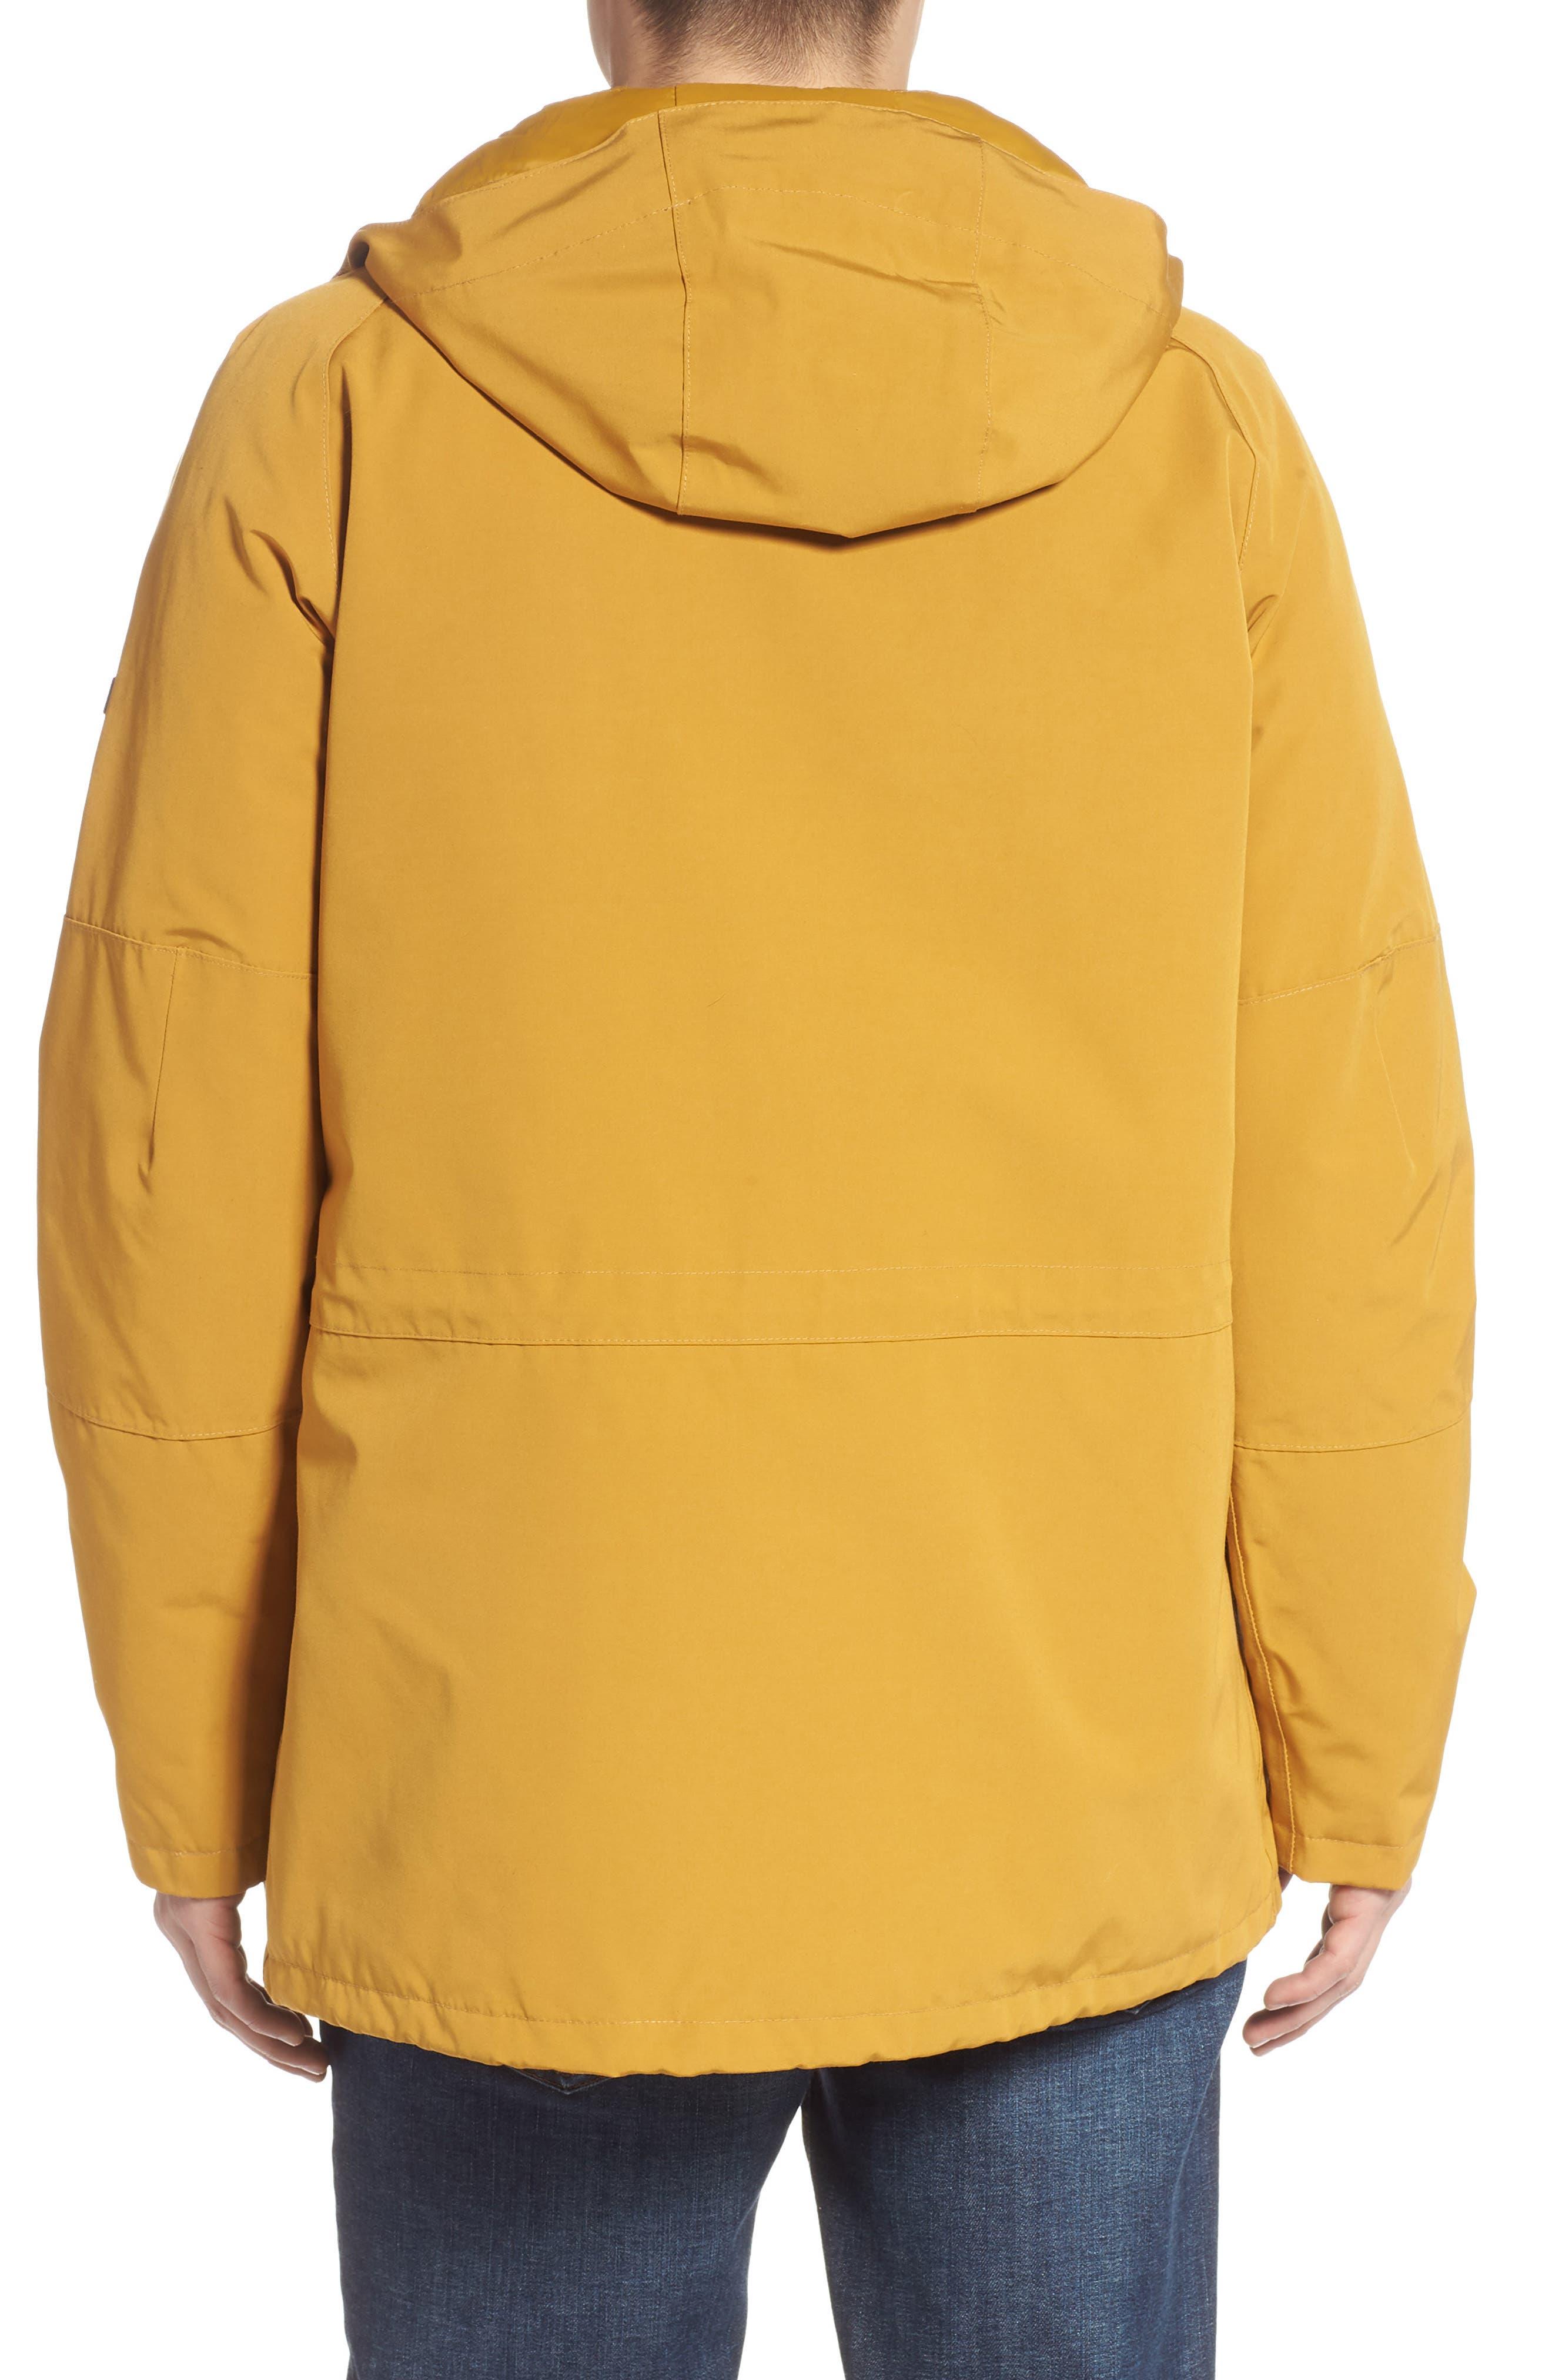 BARBOUR, Bi-Ridge Waterproof Hooded Jacket, Alternate thumbnail 2, color, YELLOW